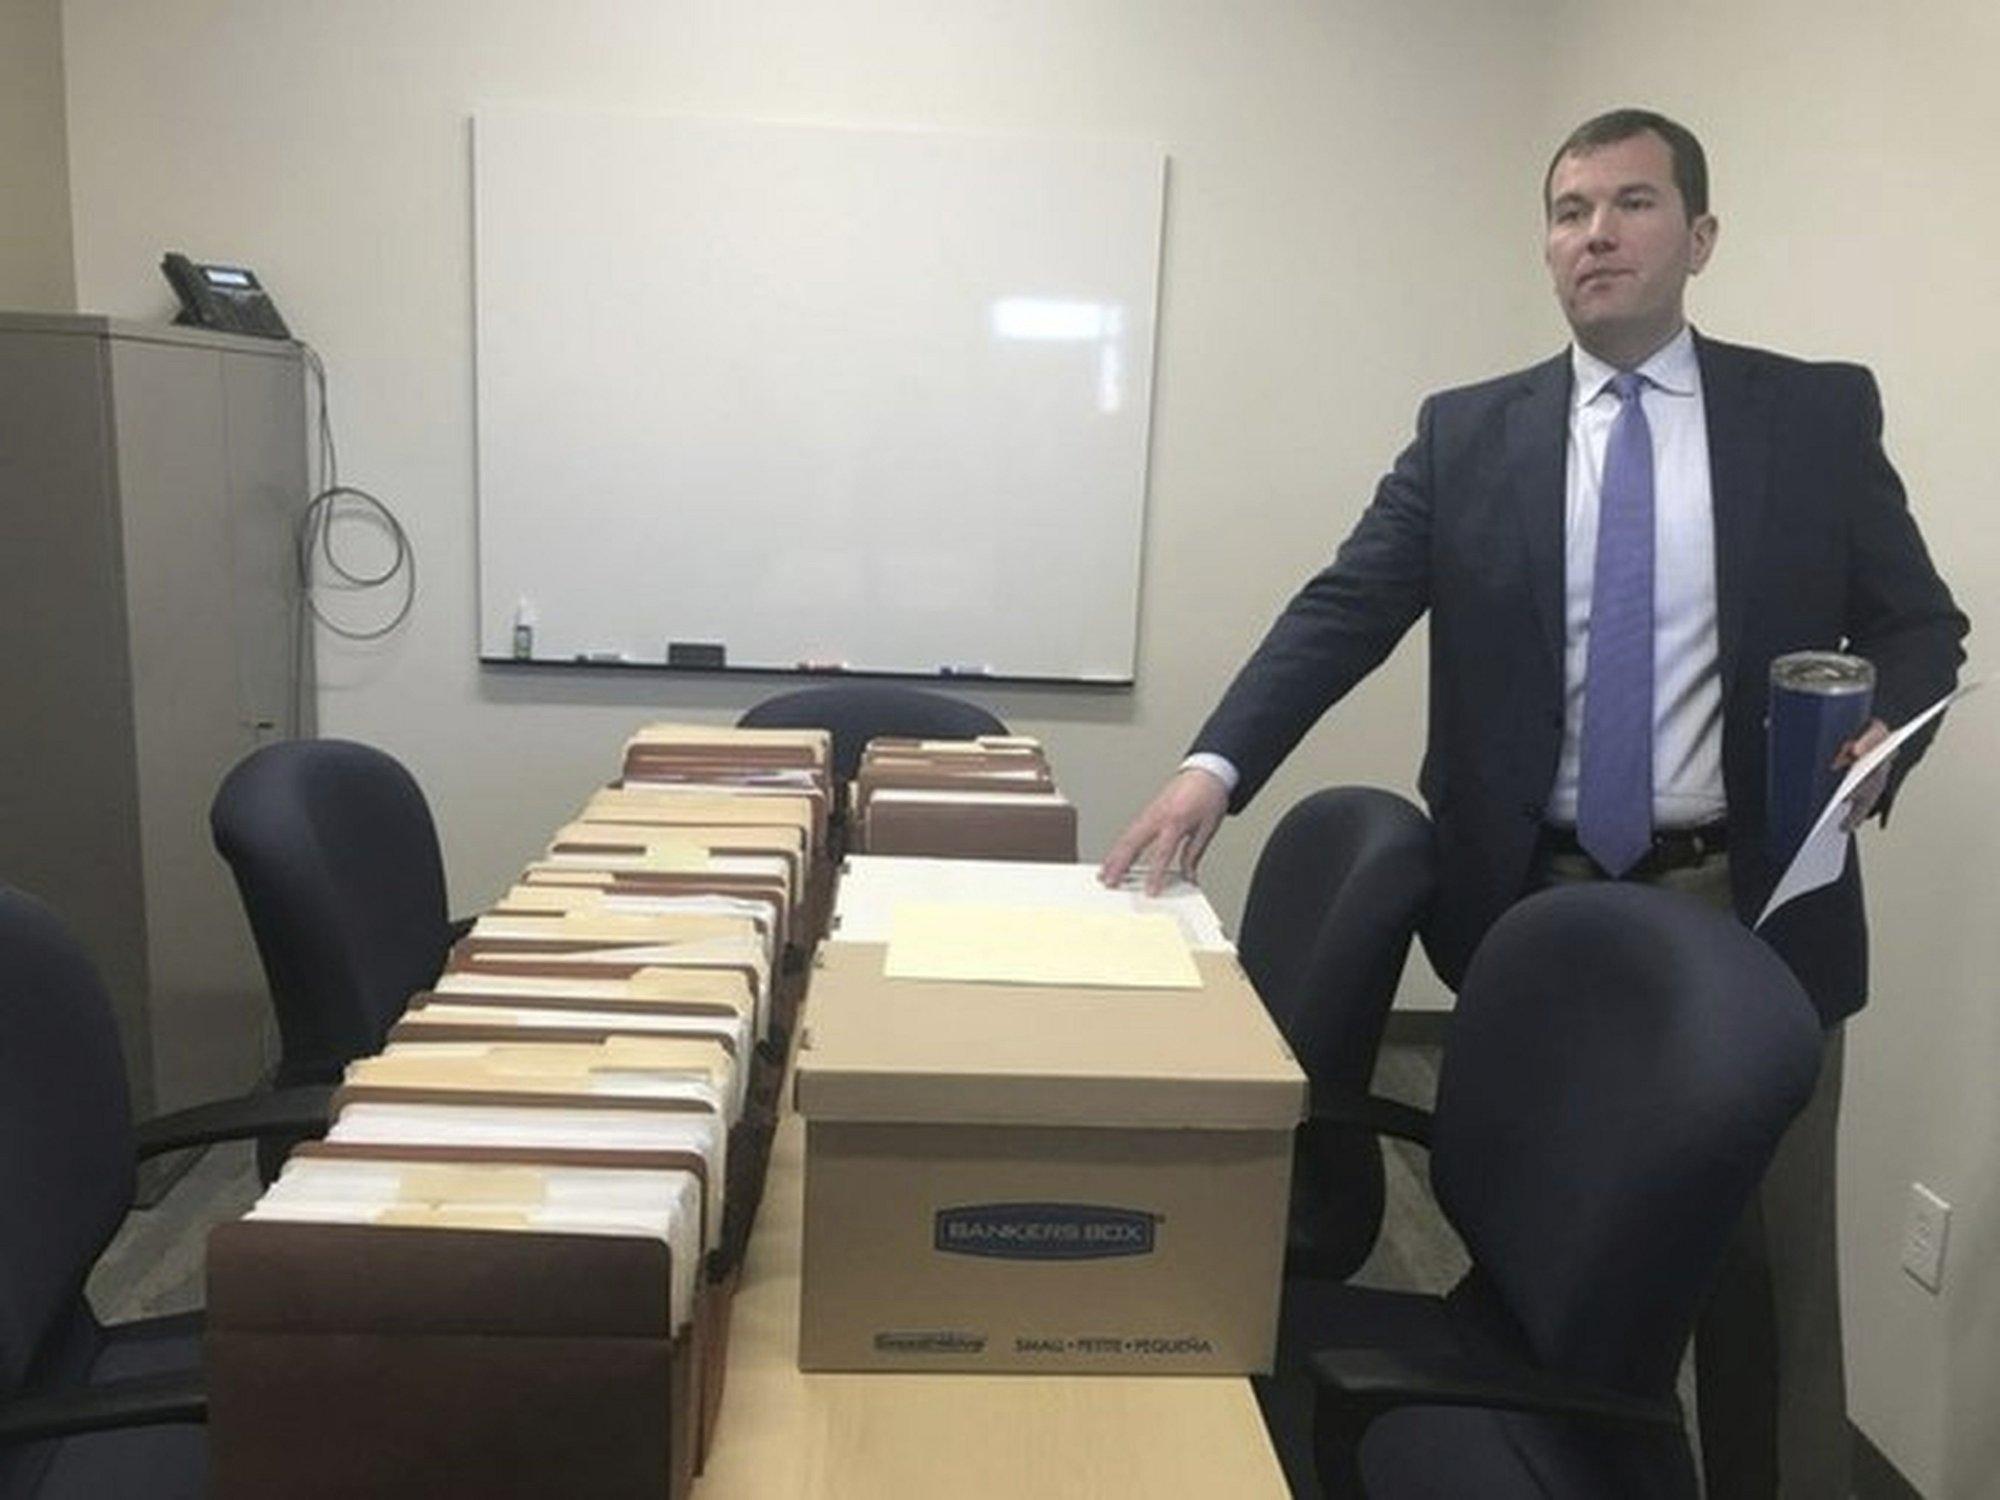 Michigan's marijuana industry now has a regulatory referee